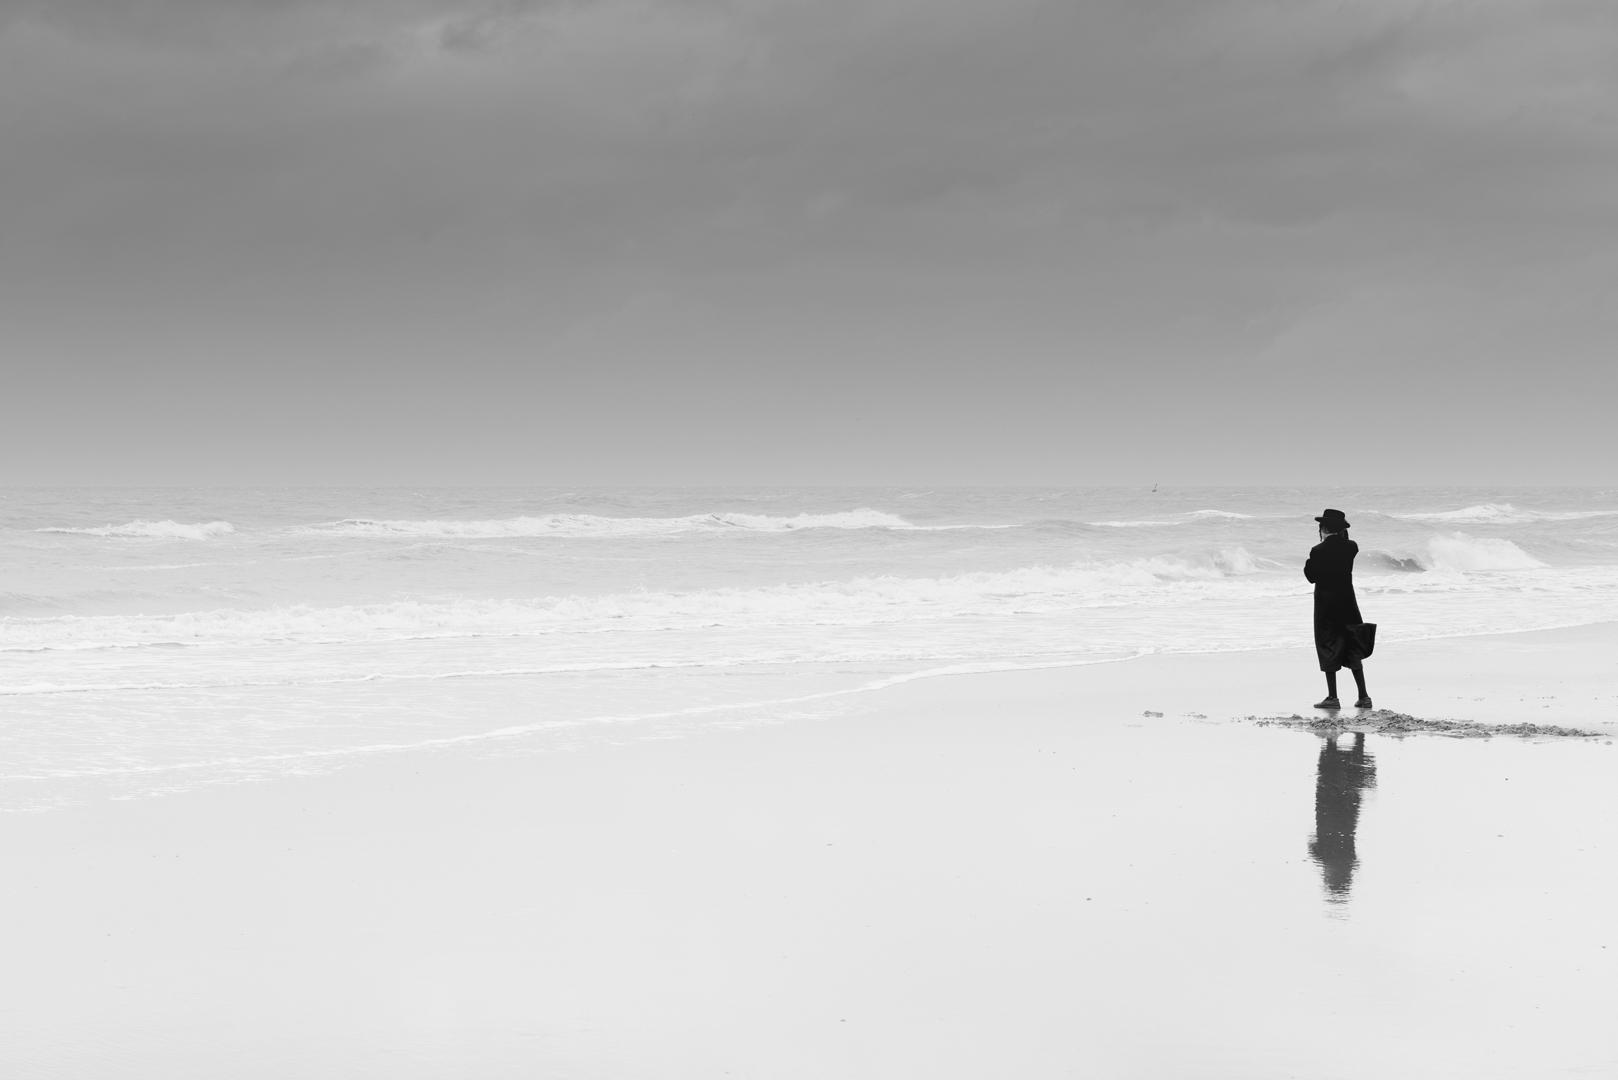 The Sea Watcher image